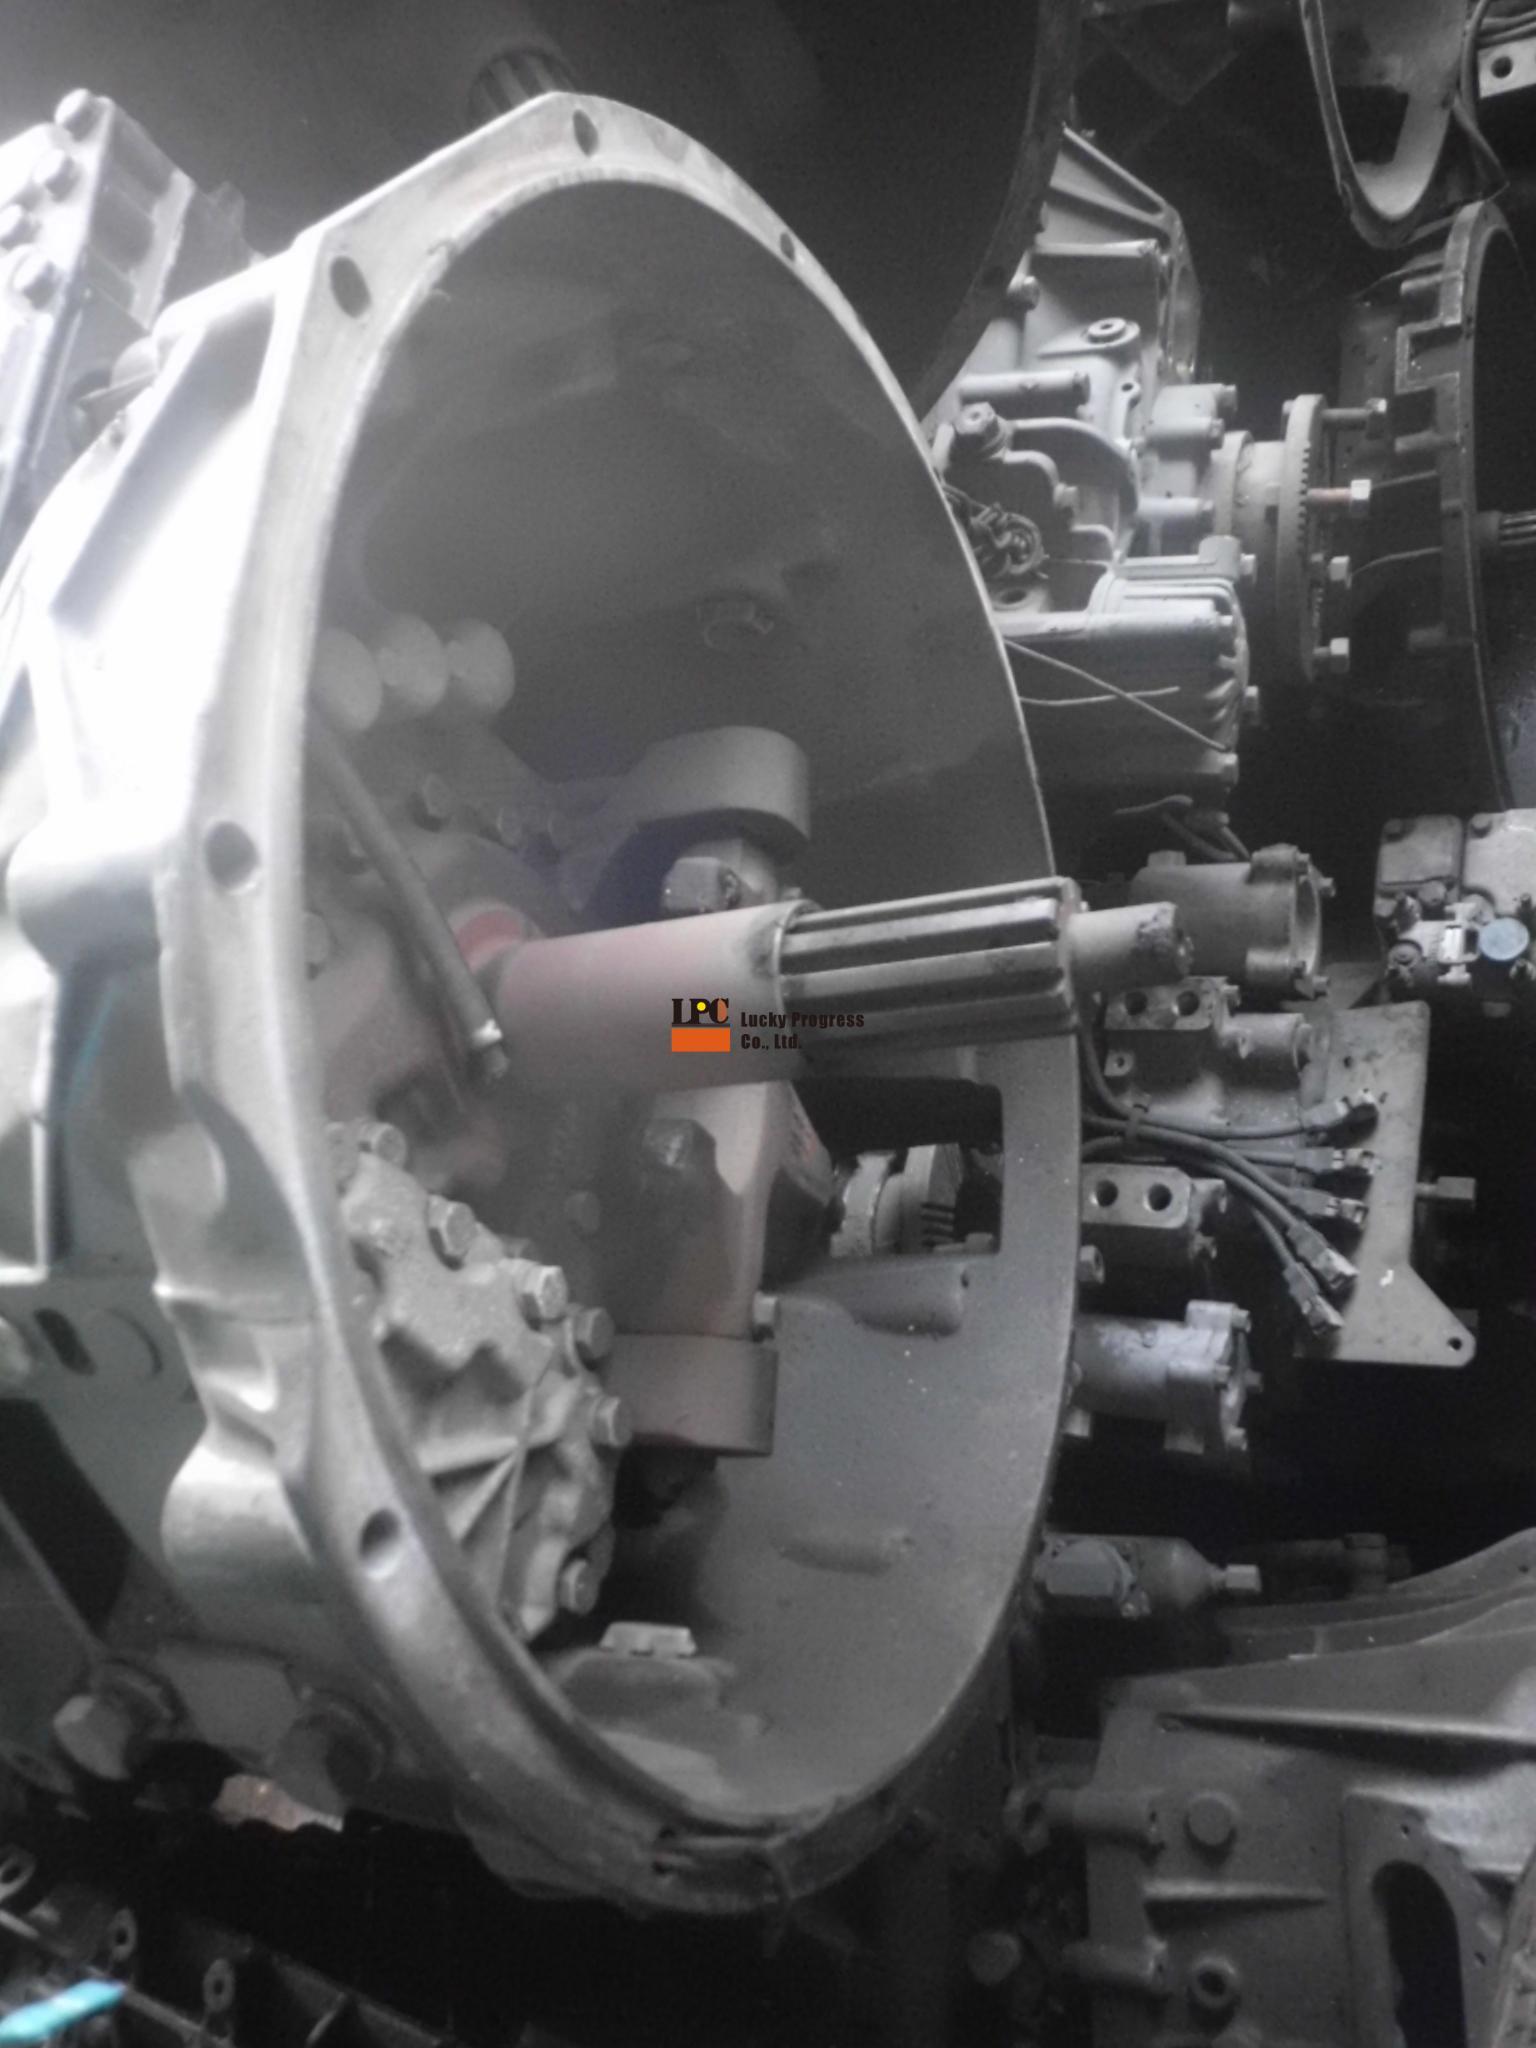 Hino Trucks Zf Transmission Wiring Diagram Truck Fuel Tank Used 700 Profia 16s 221 Lucky Progress Co Transmissions